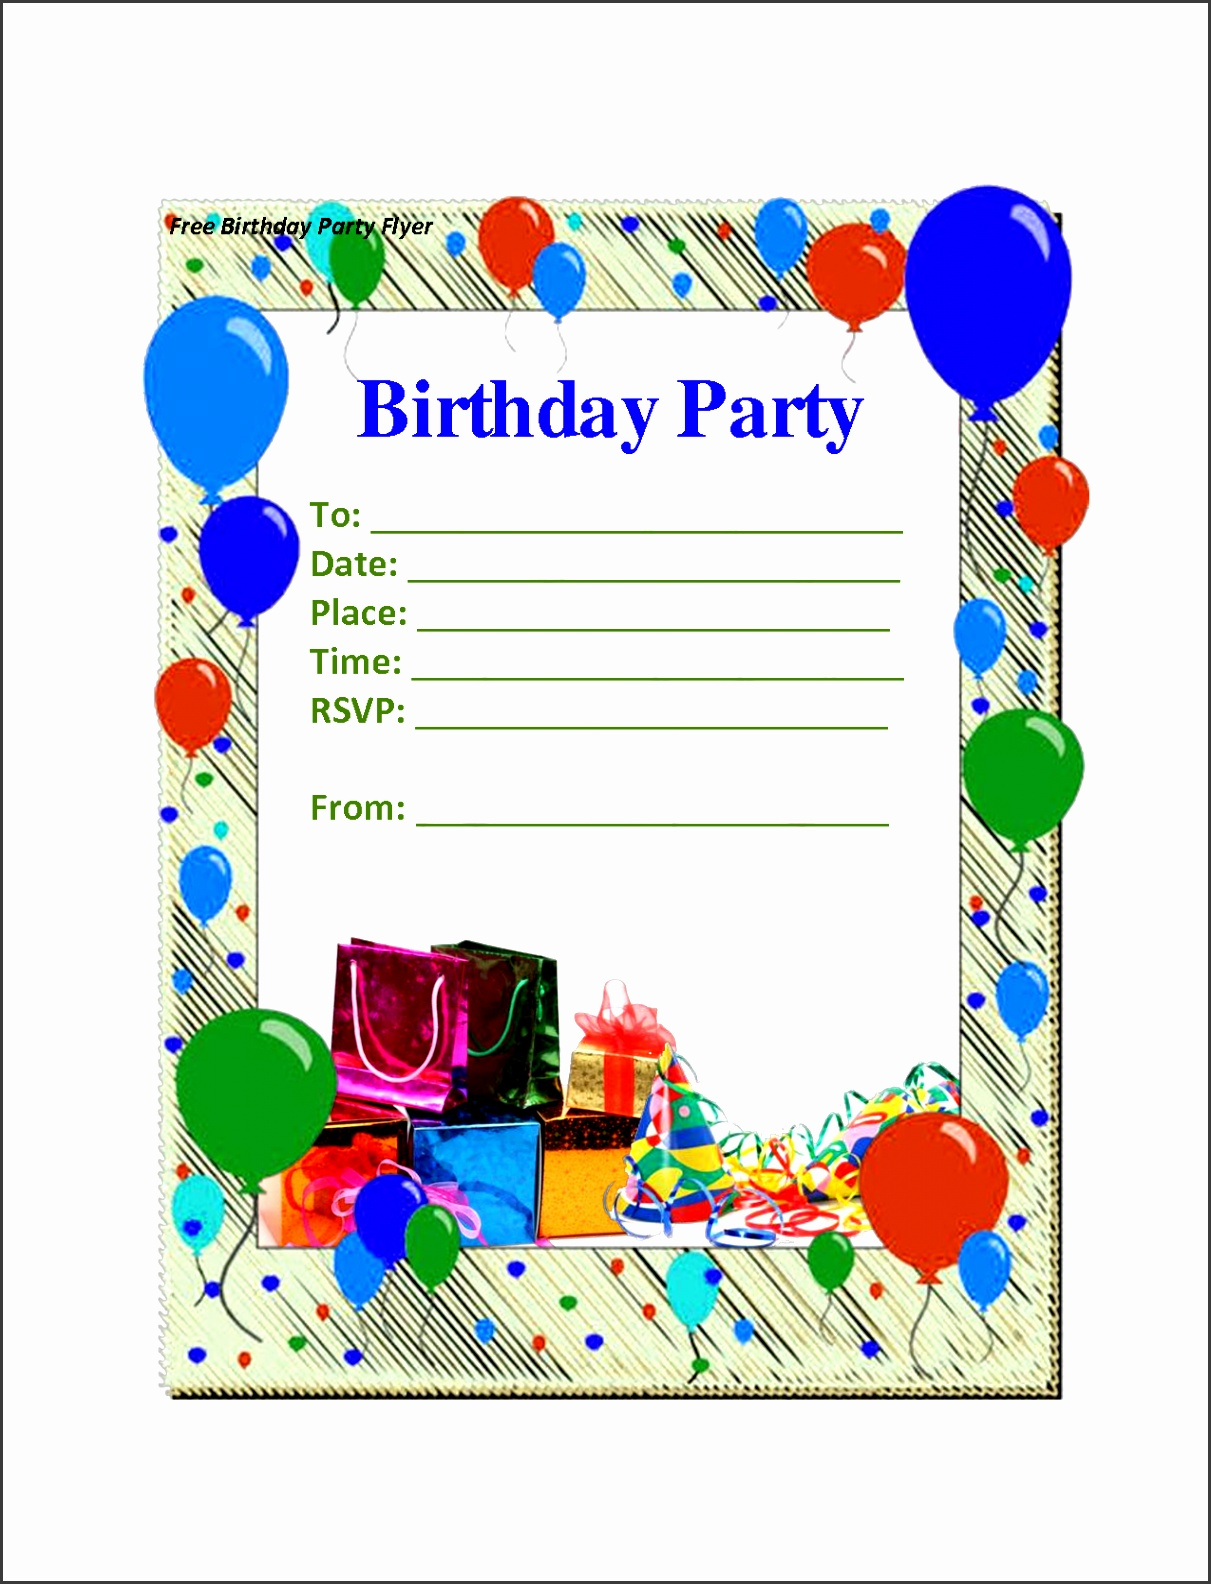 9 microsoft office birthday card templates